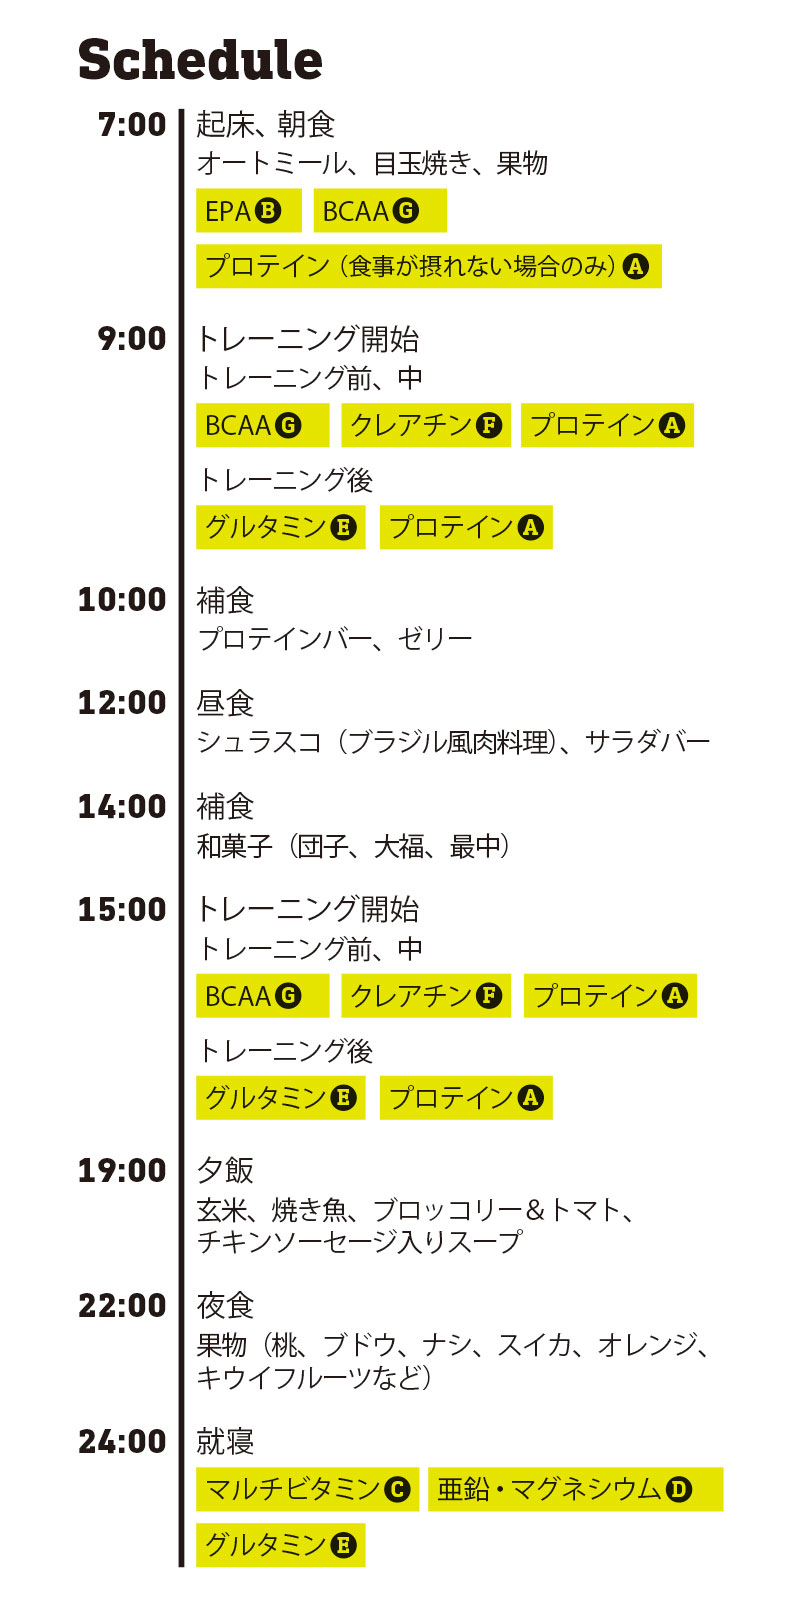 20181121rm_schedule02-02